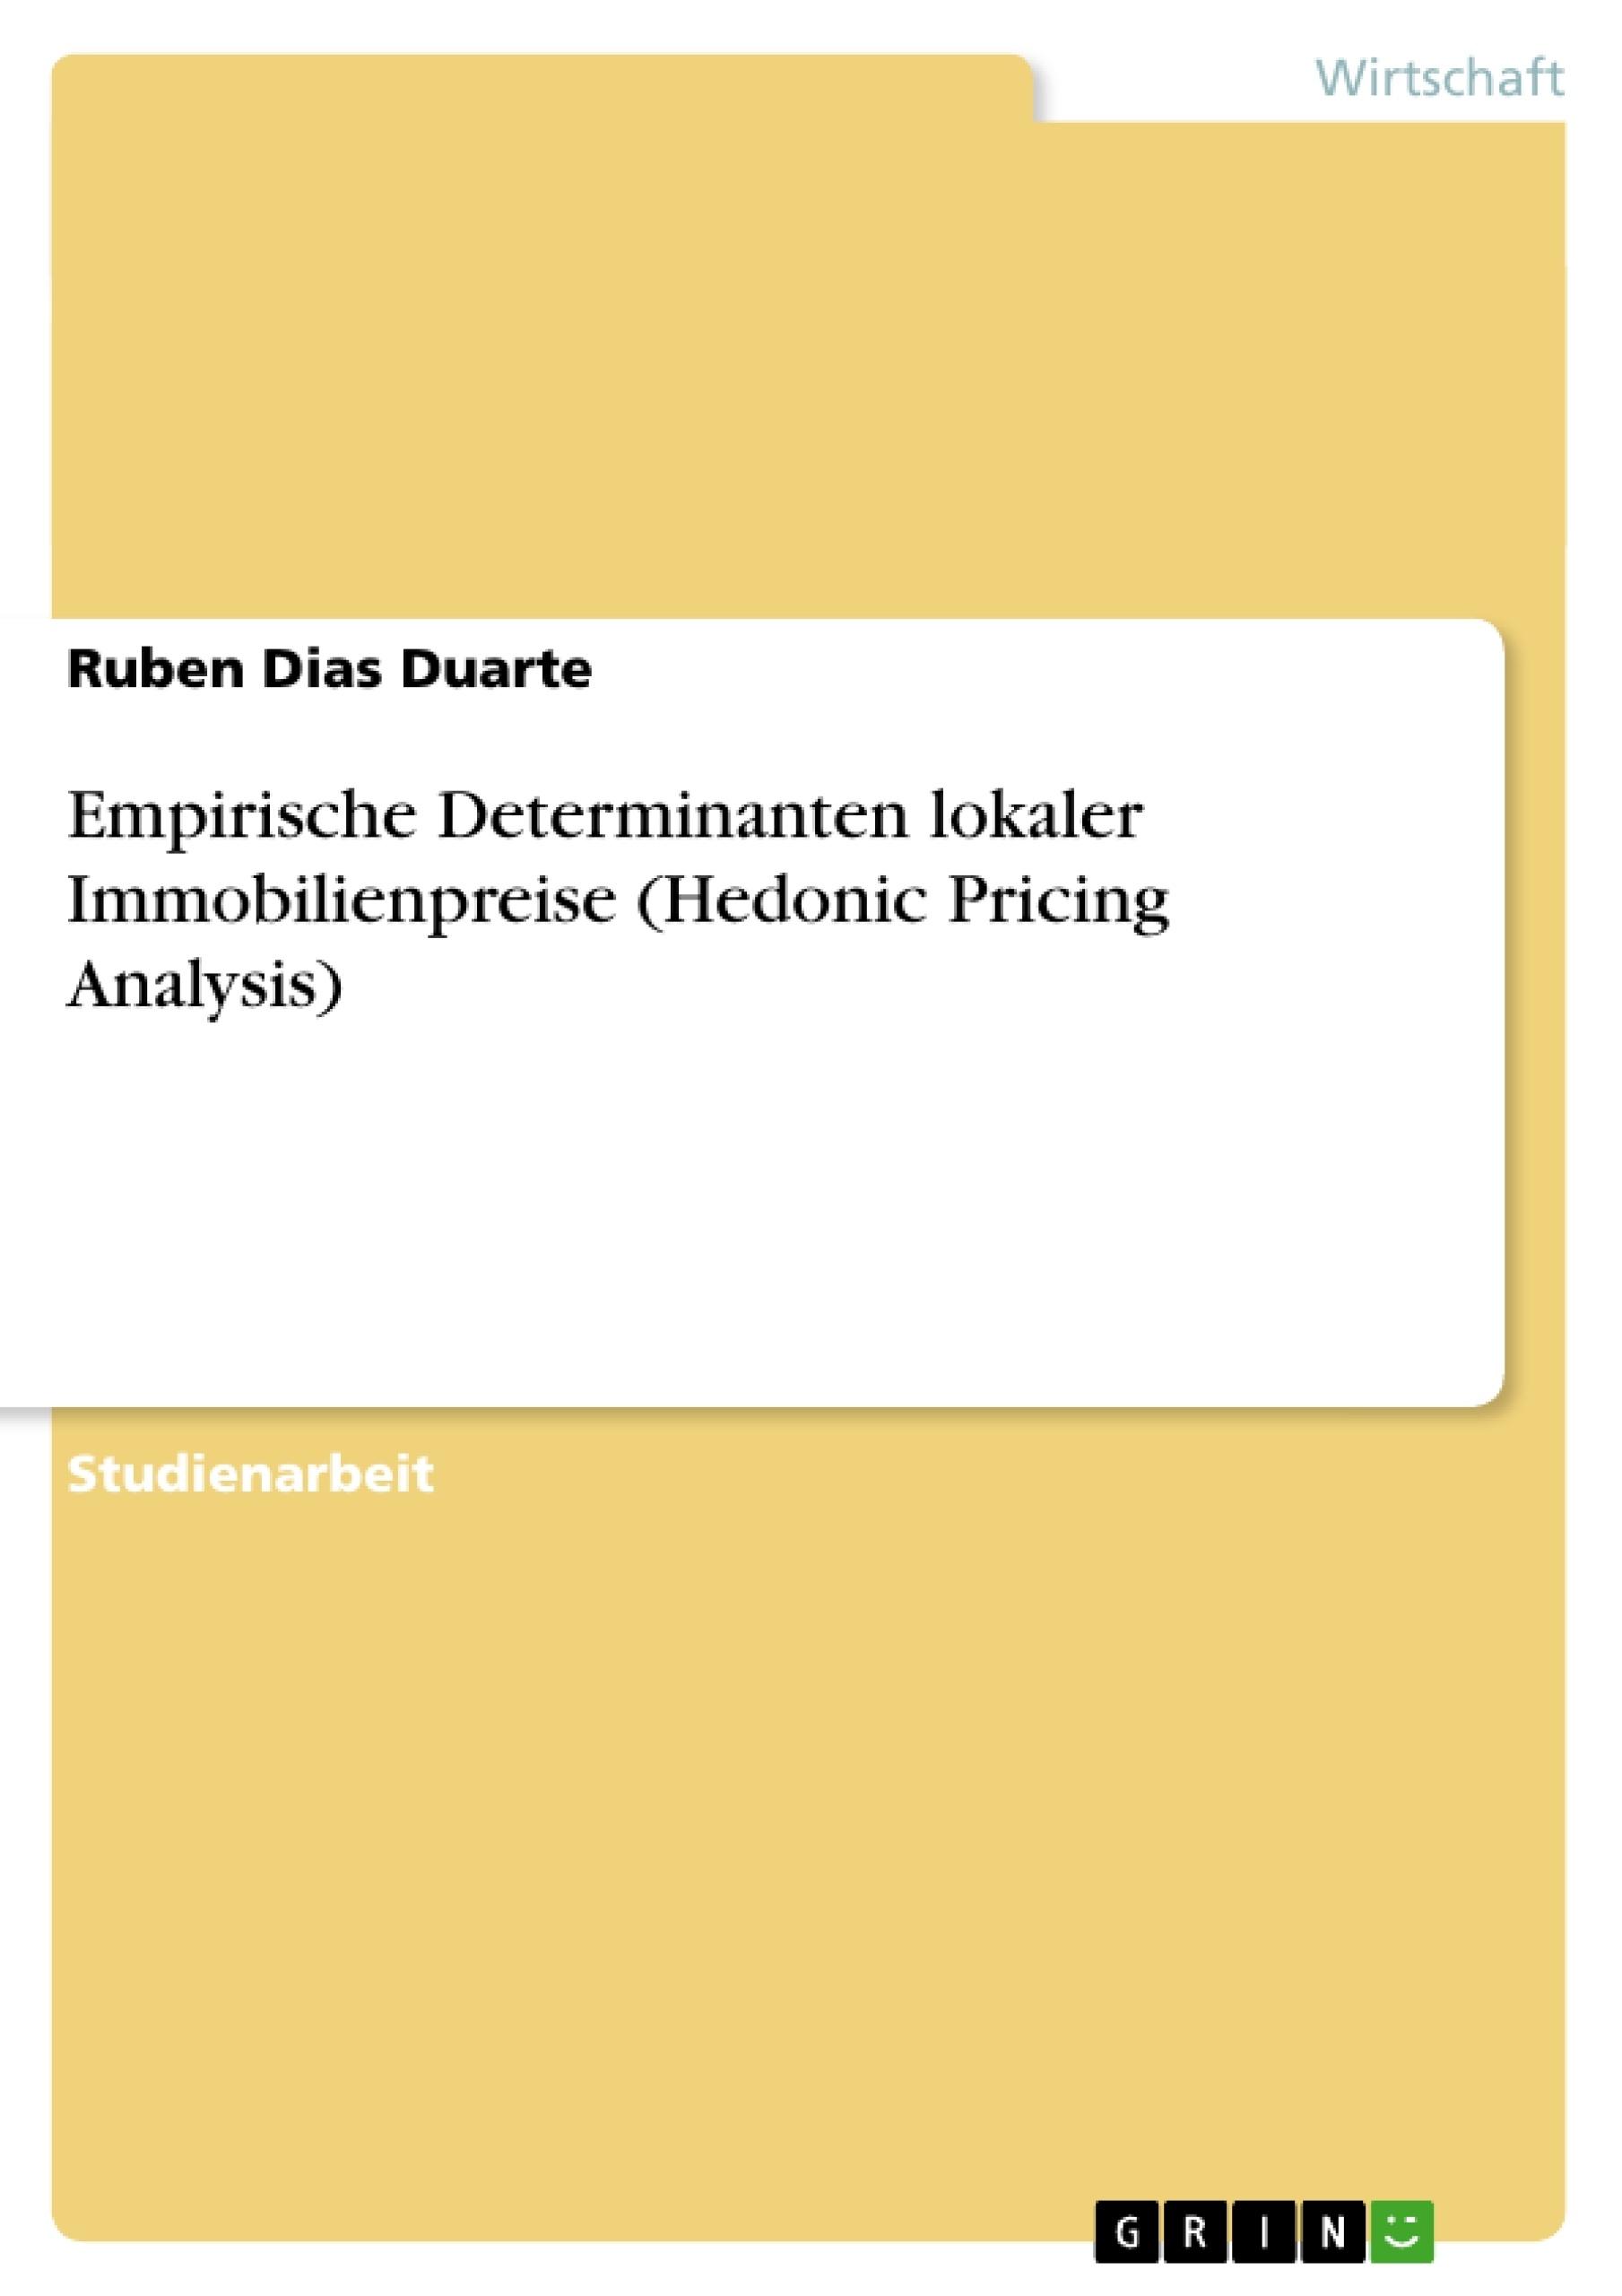 Titel: Empirische Determinanten lokaler Immobilienpreise (Hedonic Pricing Analysis)